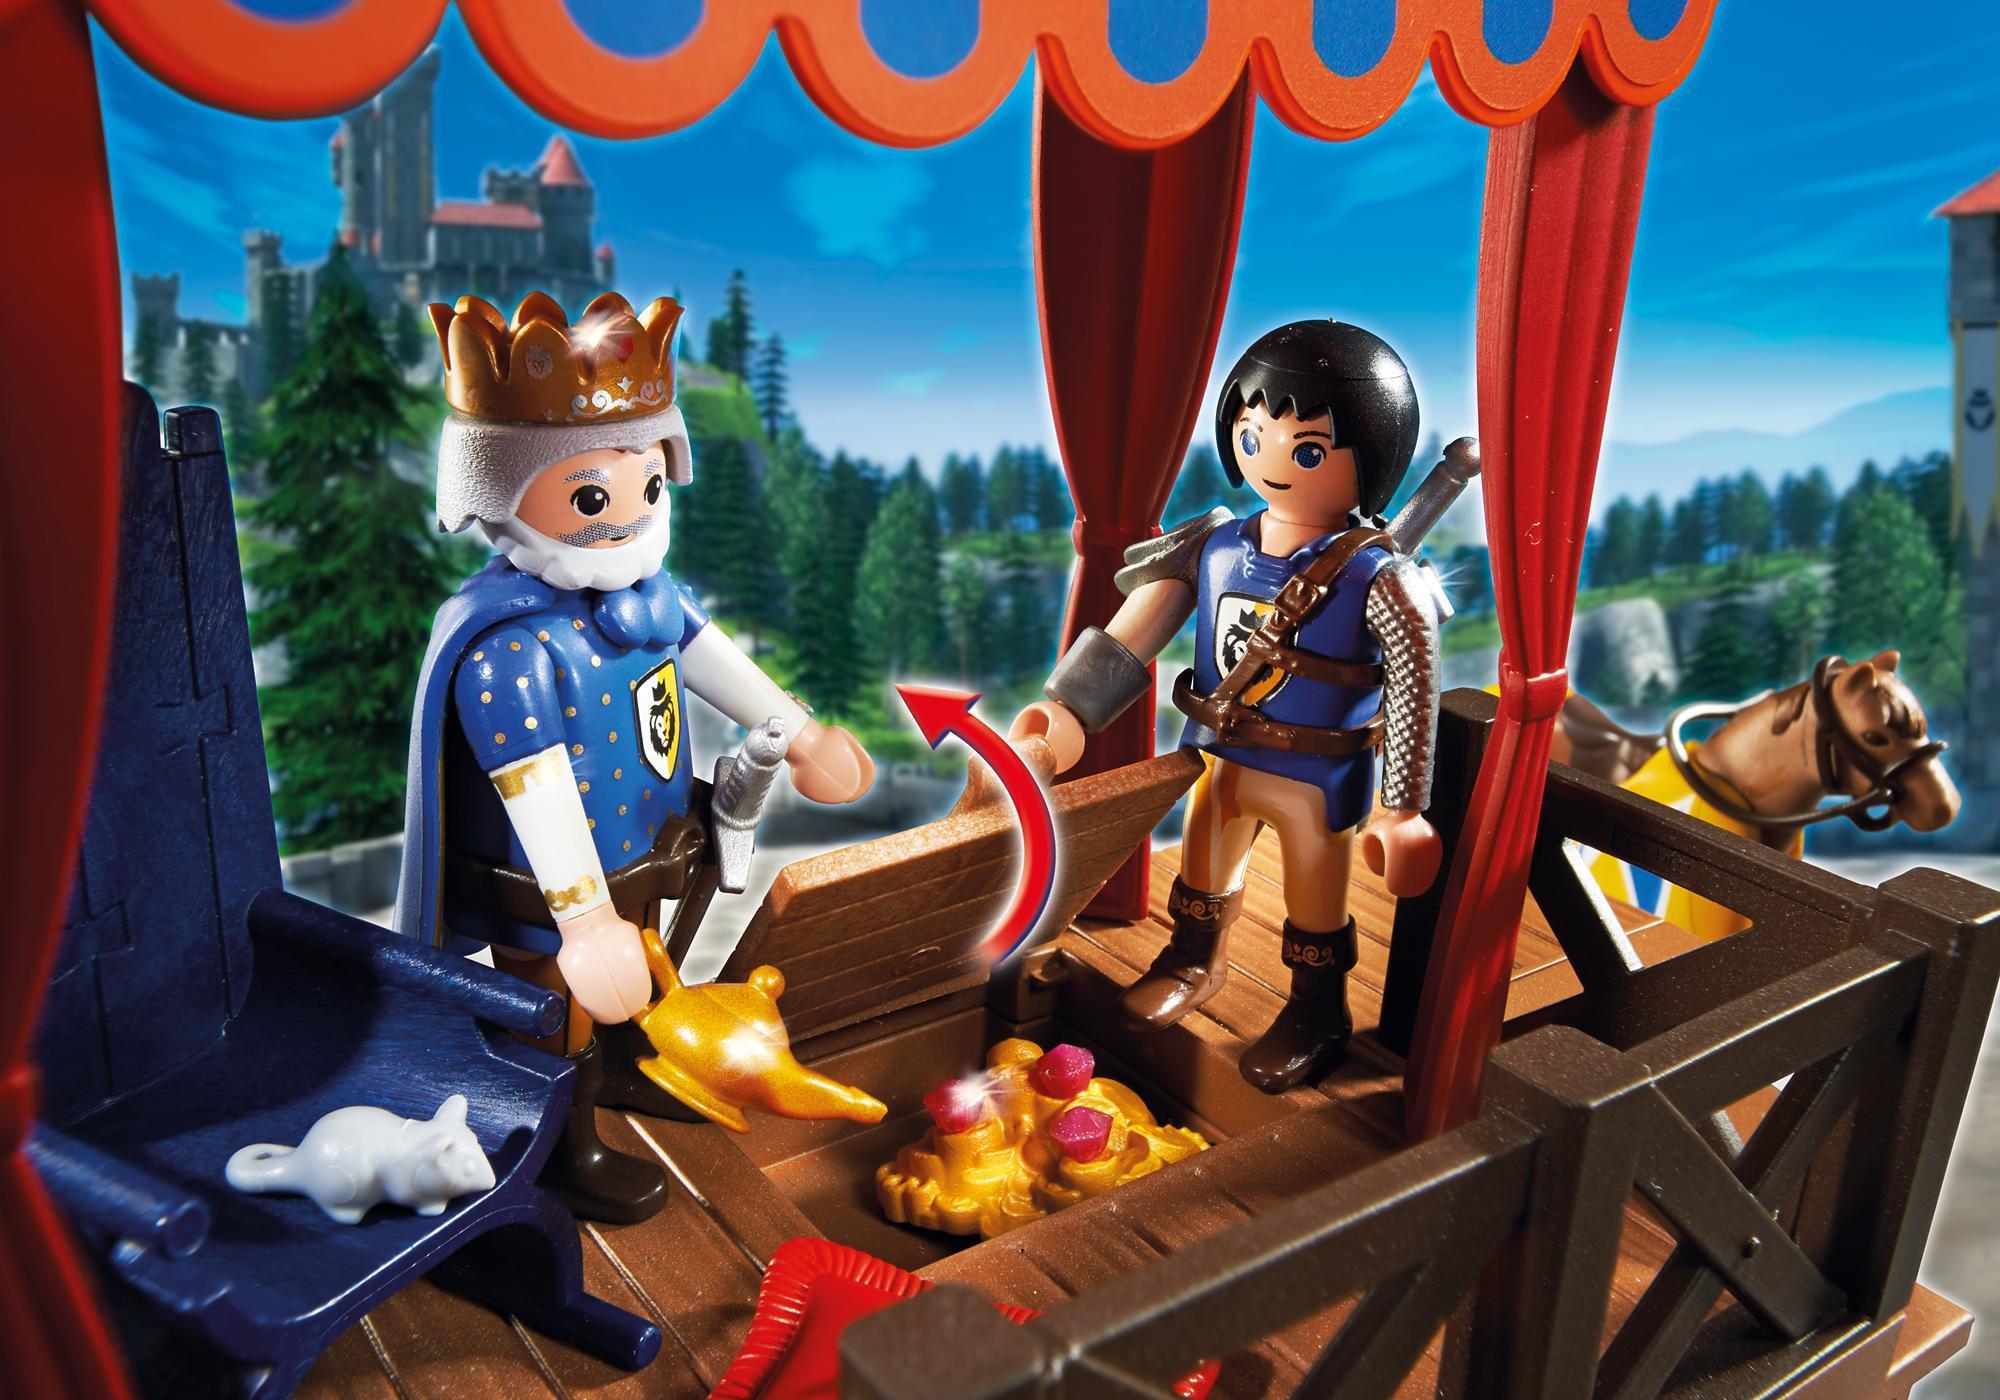 http://media.playmobil.com/i/playmobil/6695_product_extra1/Königstribüne mit Alex